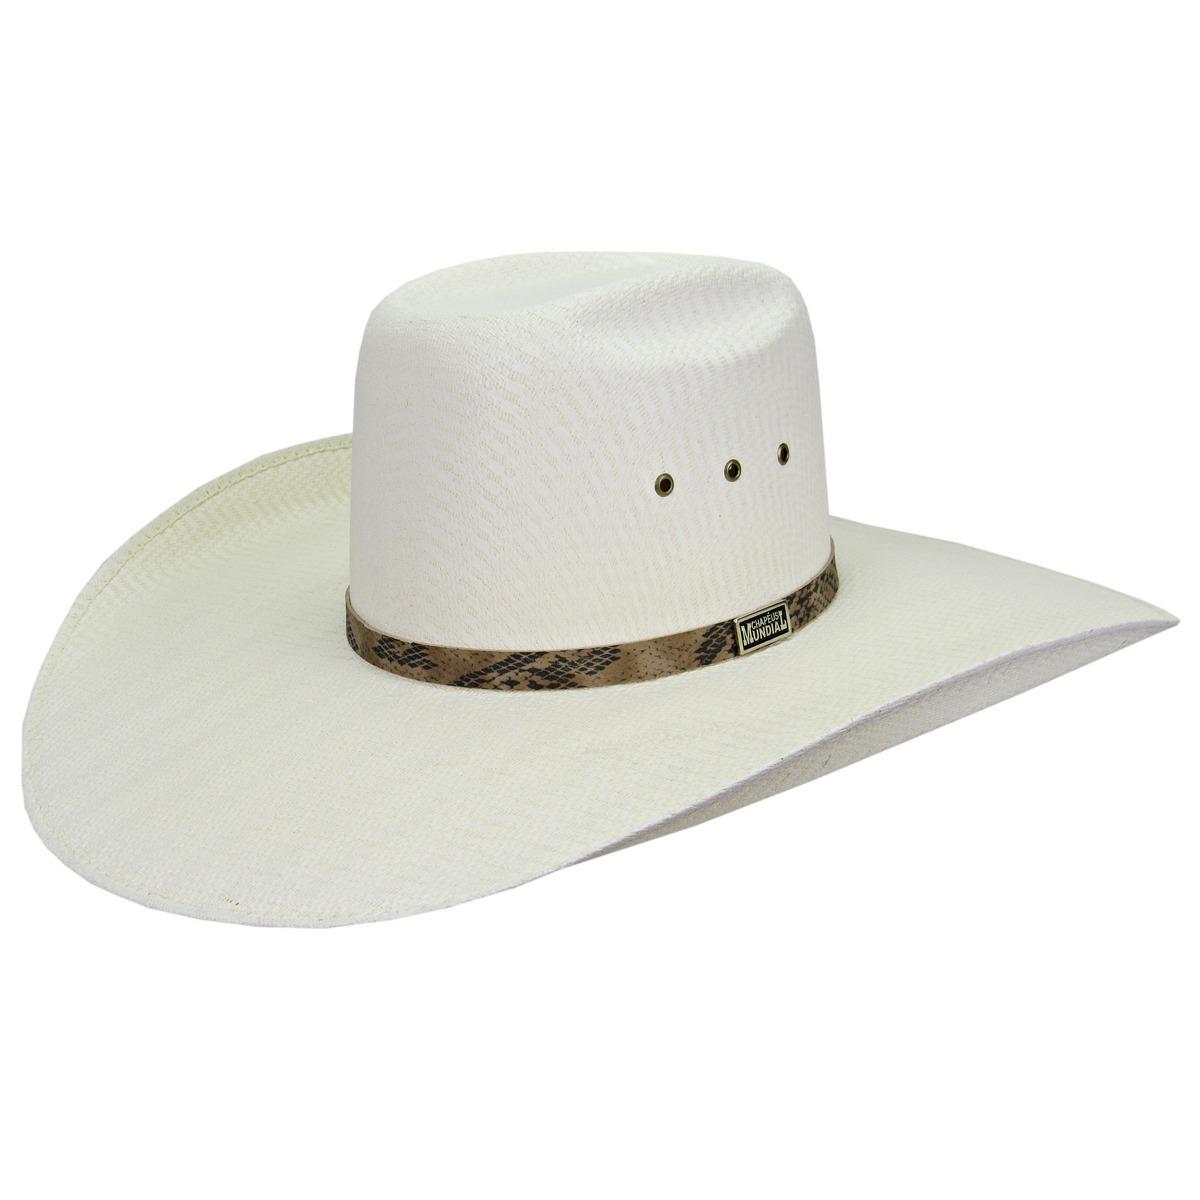 431f20150 chapéu country aba 12 cowboy barretos sertanejo mundial + nf. Carregando  zoom.